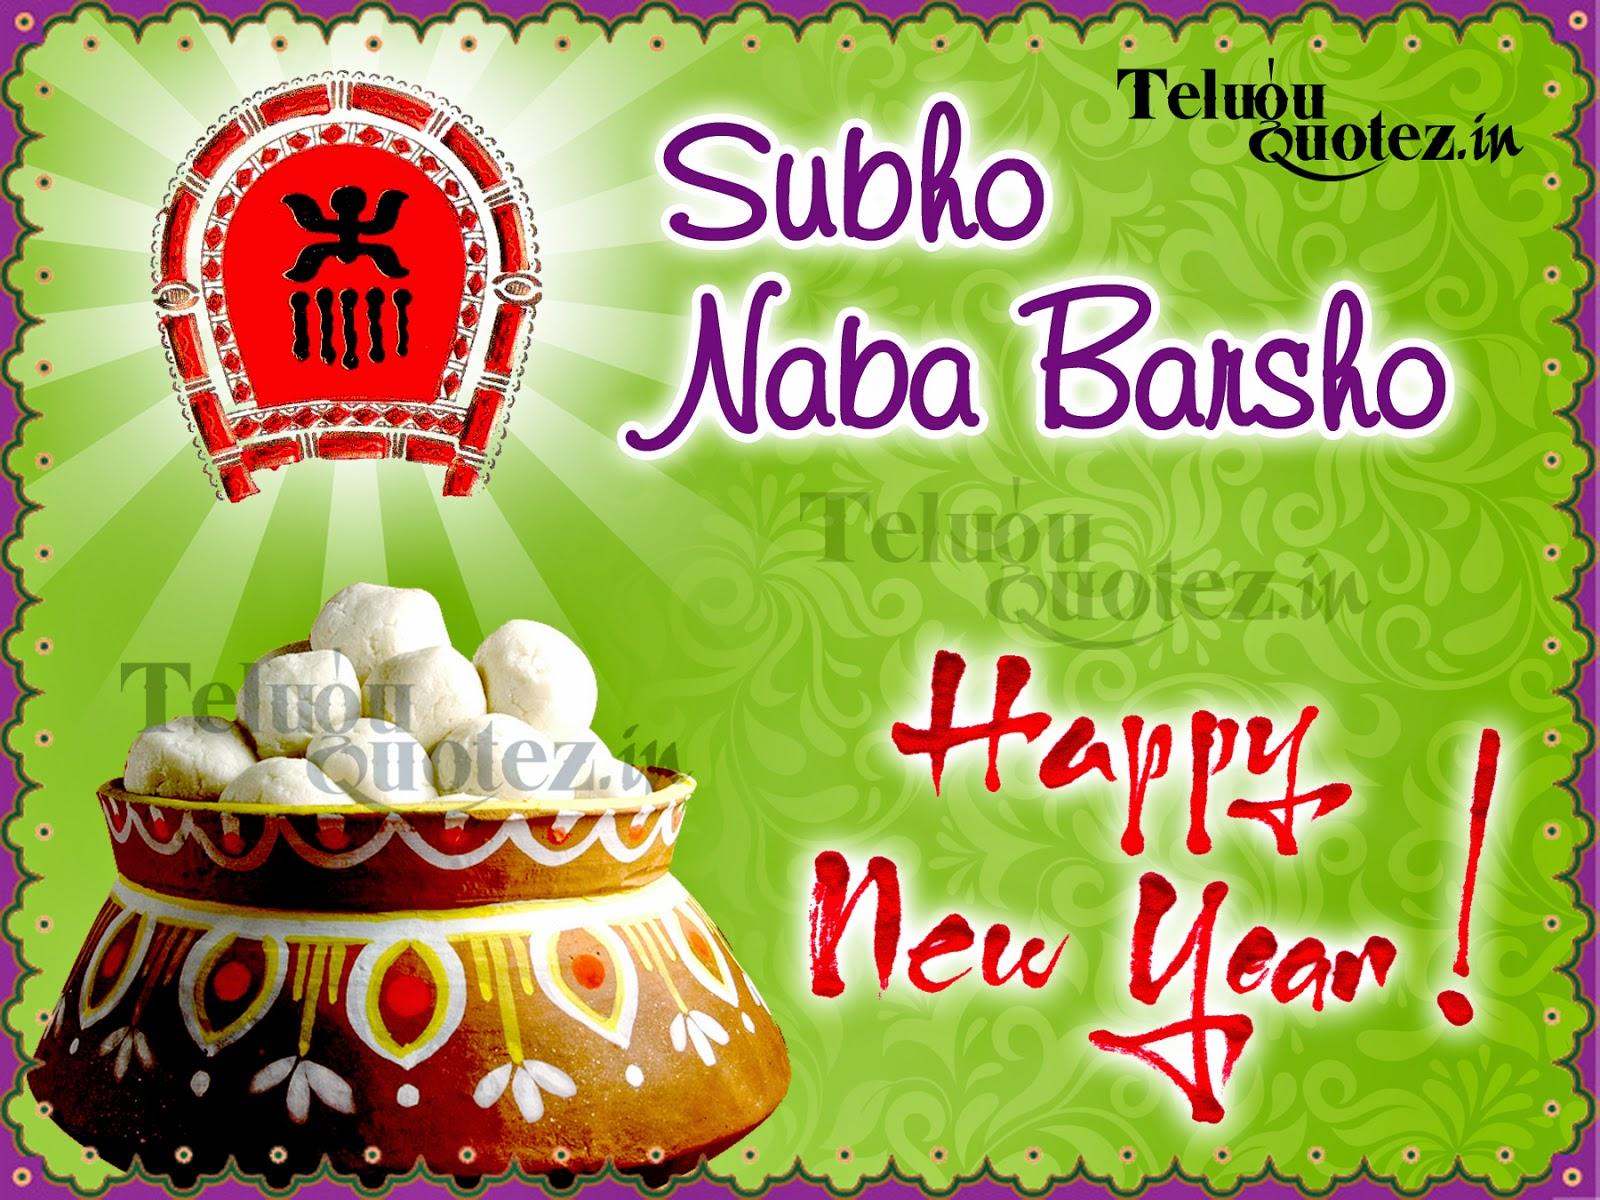 New year wishes quotes in bengali naveengfx bengali quotes happy new year bengali quotes happy new year bengali wishes quotes bengali wishes on hapy new year subho nababarshosubho nabo basrho m4hsunfo